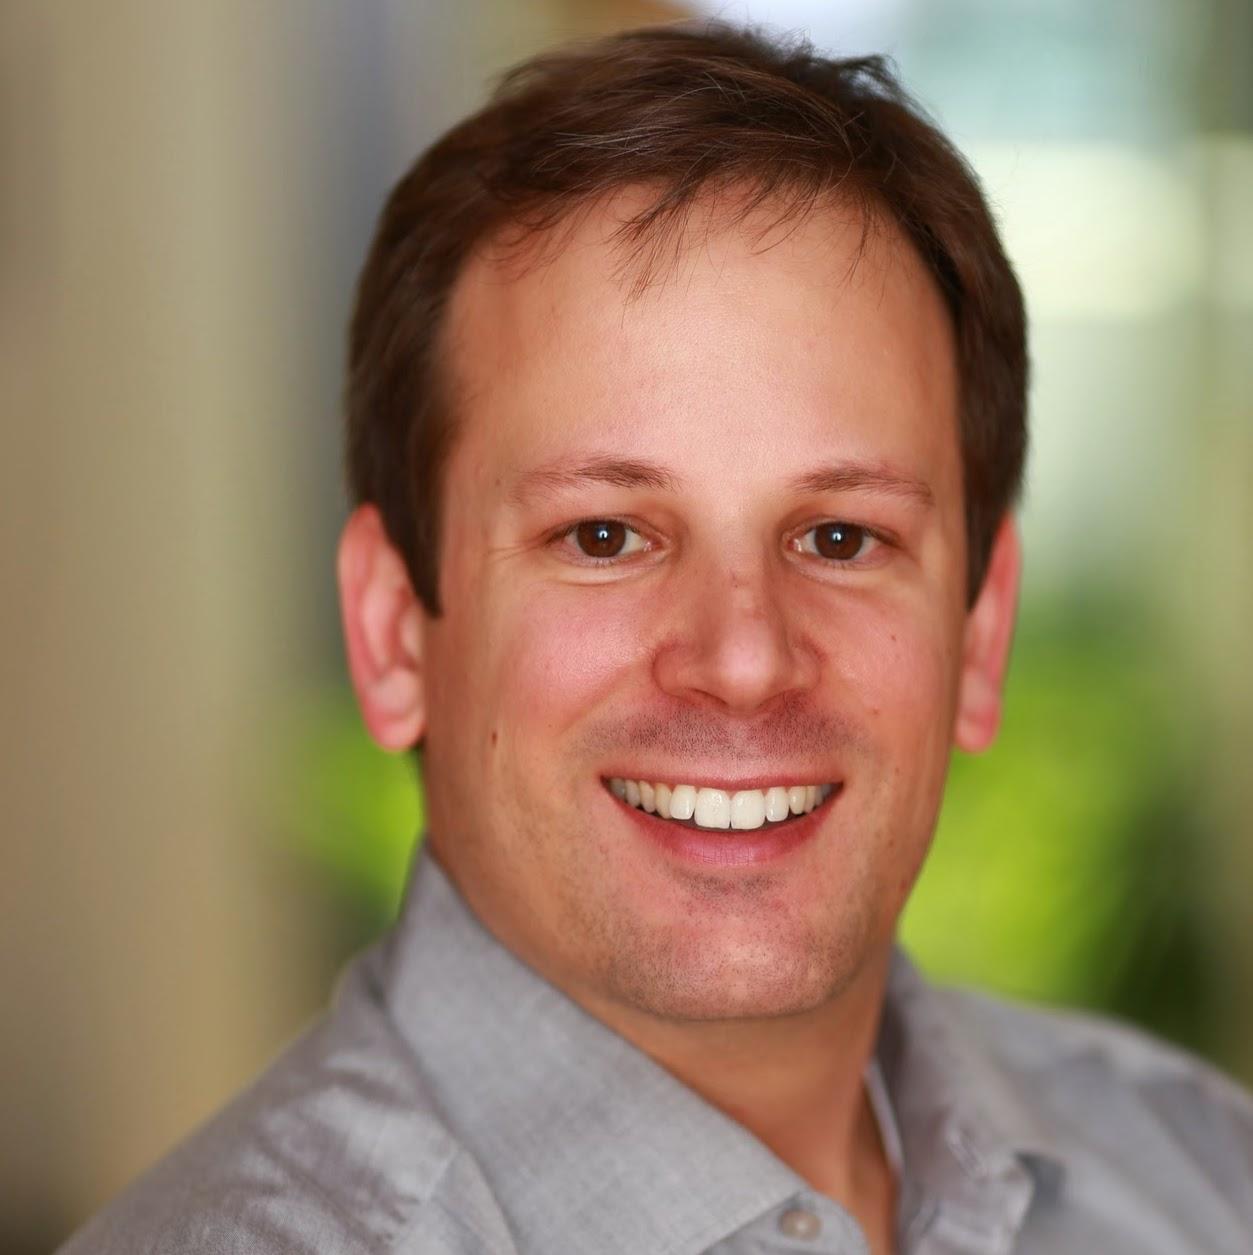 Michael rohmedder